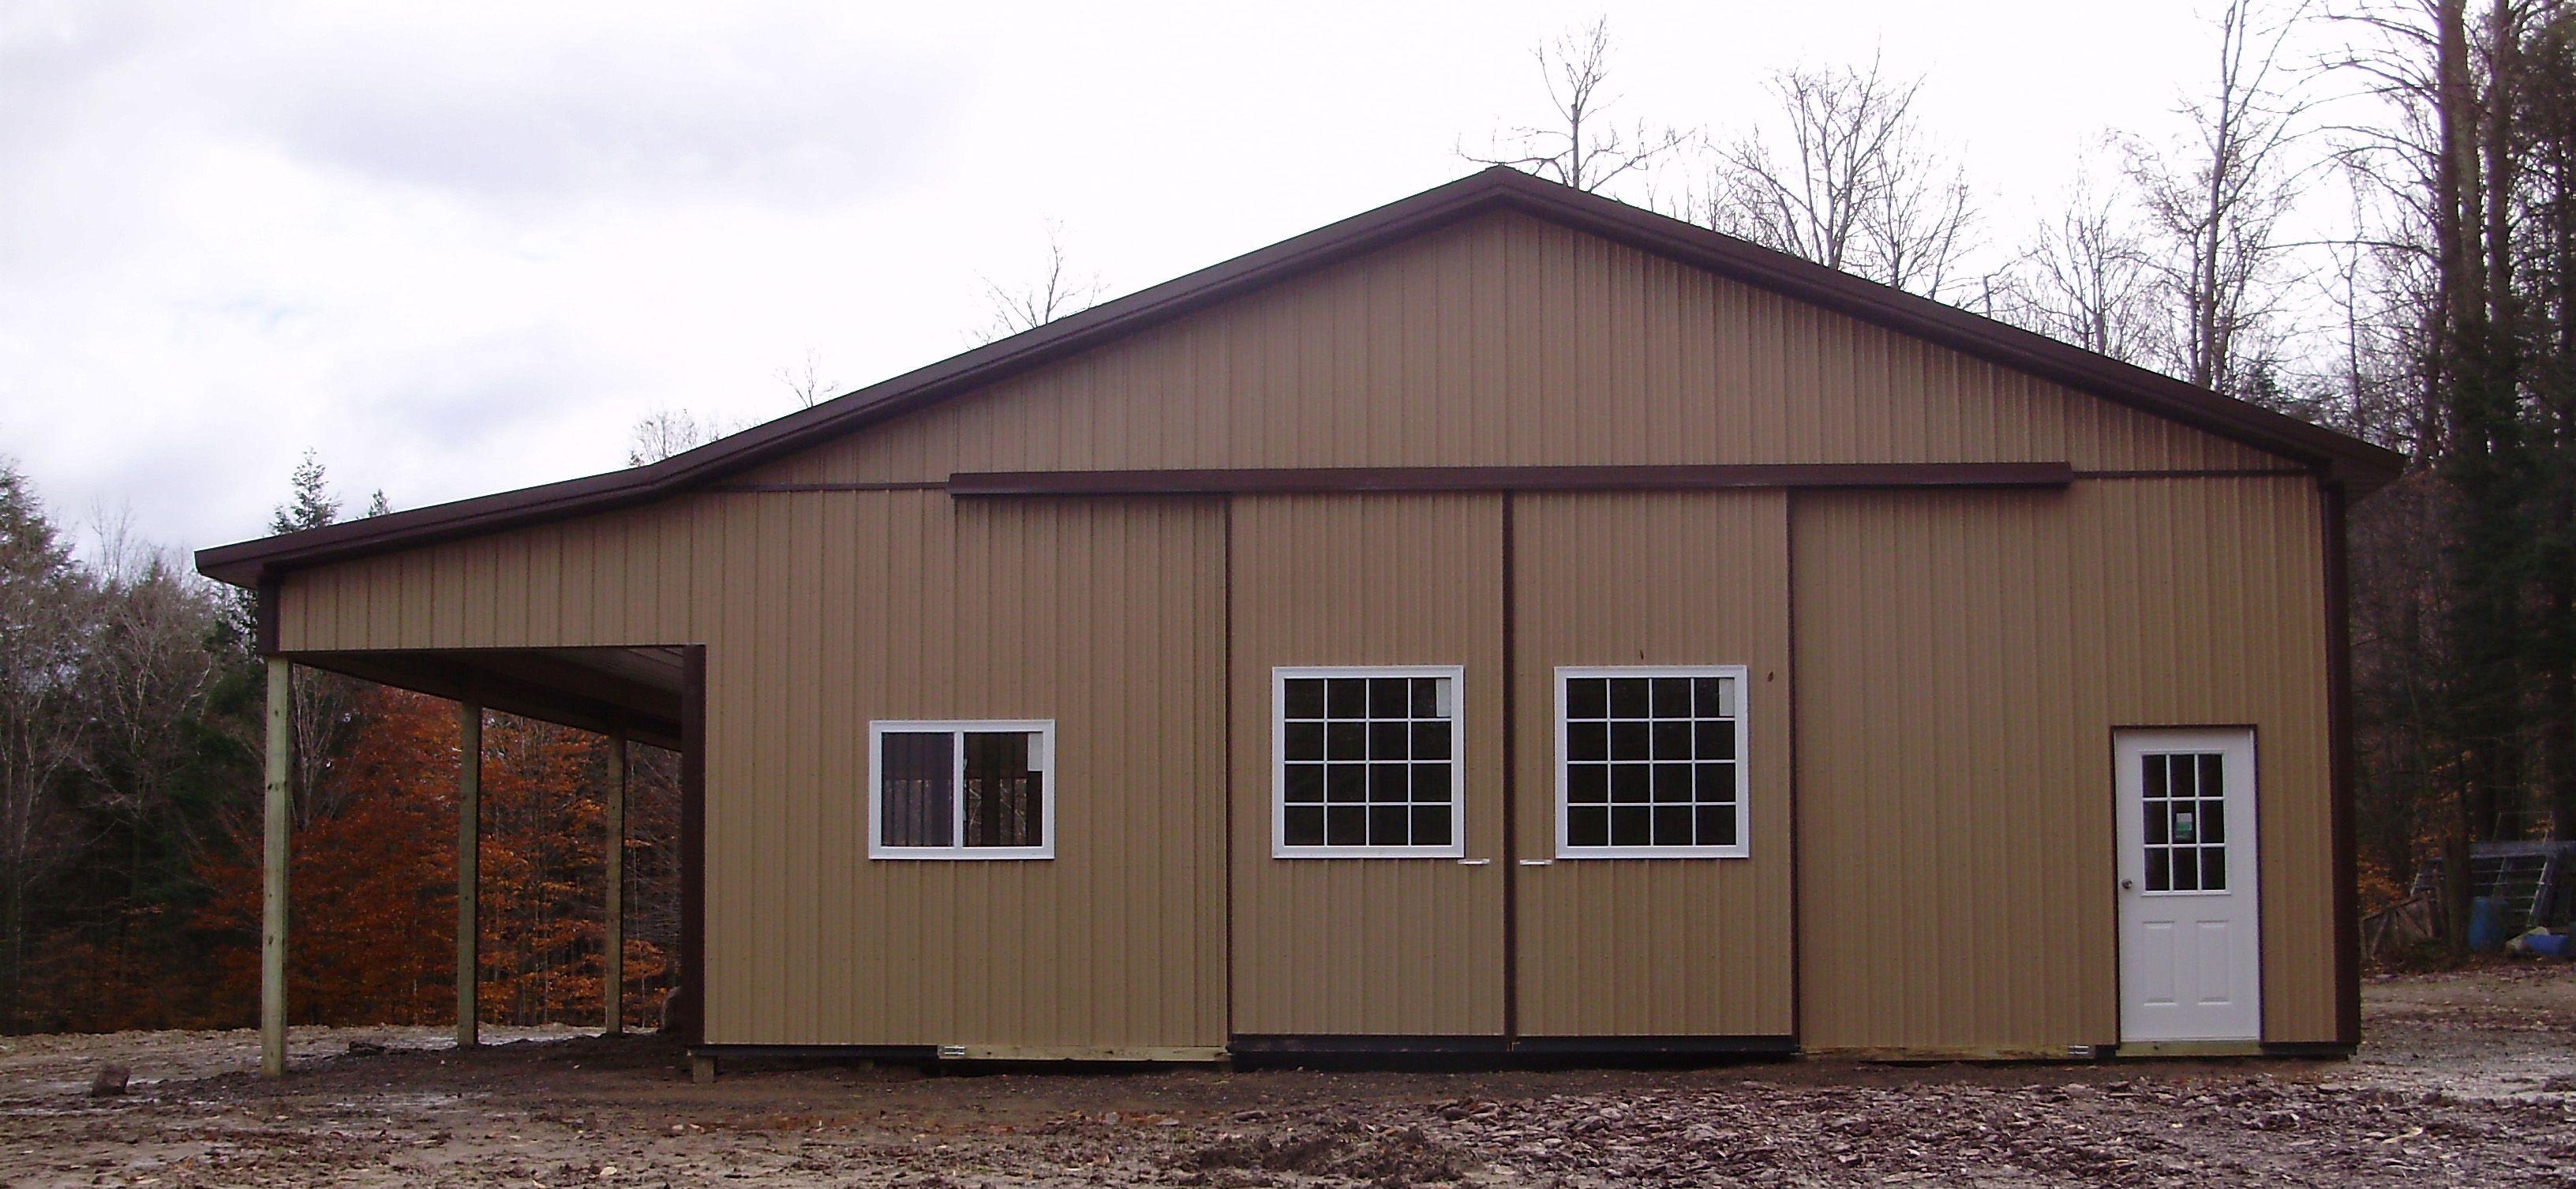 Building dimensions 36 w x 48 l x 12 4 h id 256 36 for Pole barn dimensions